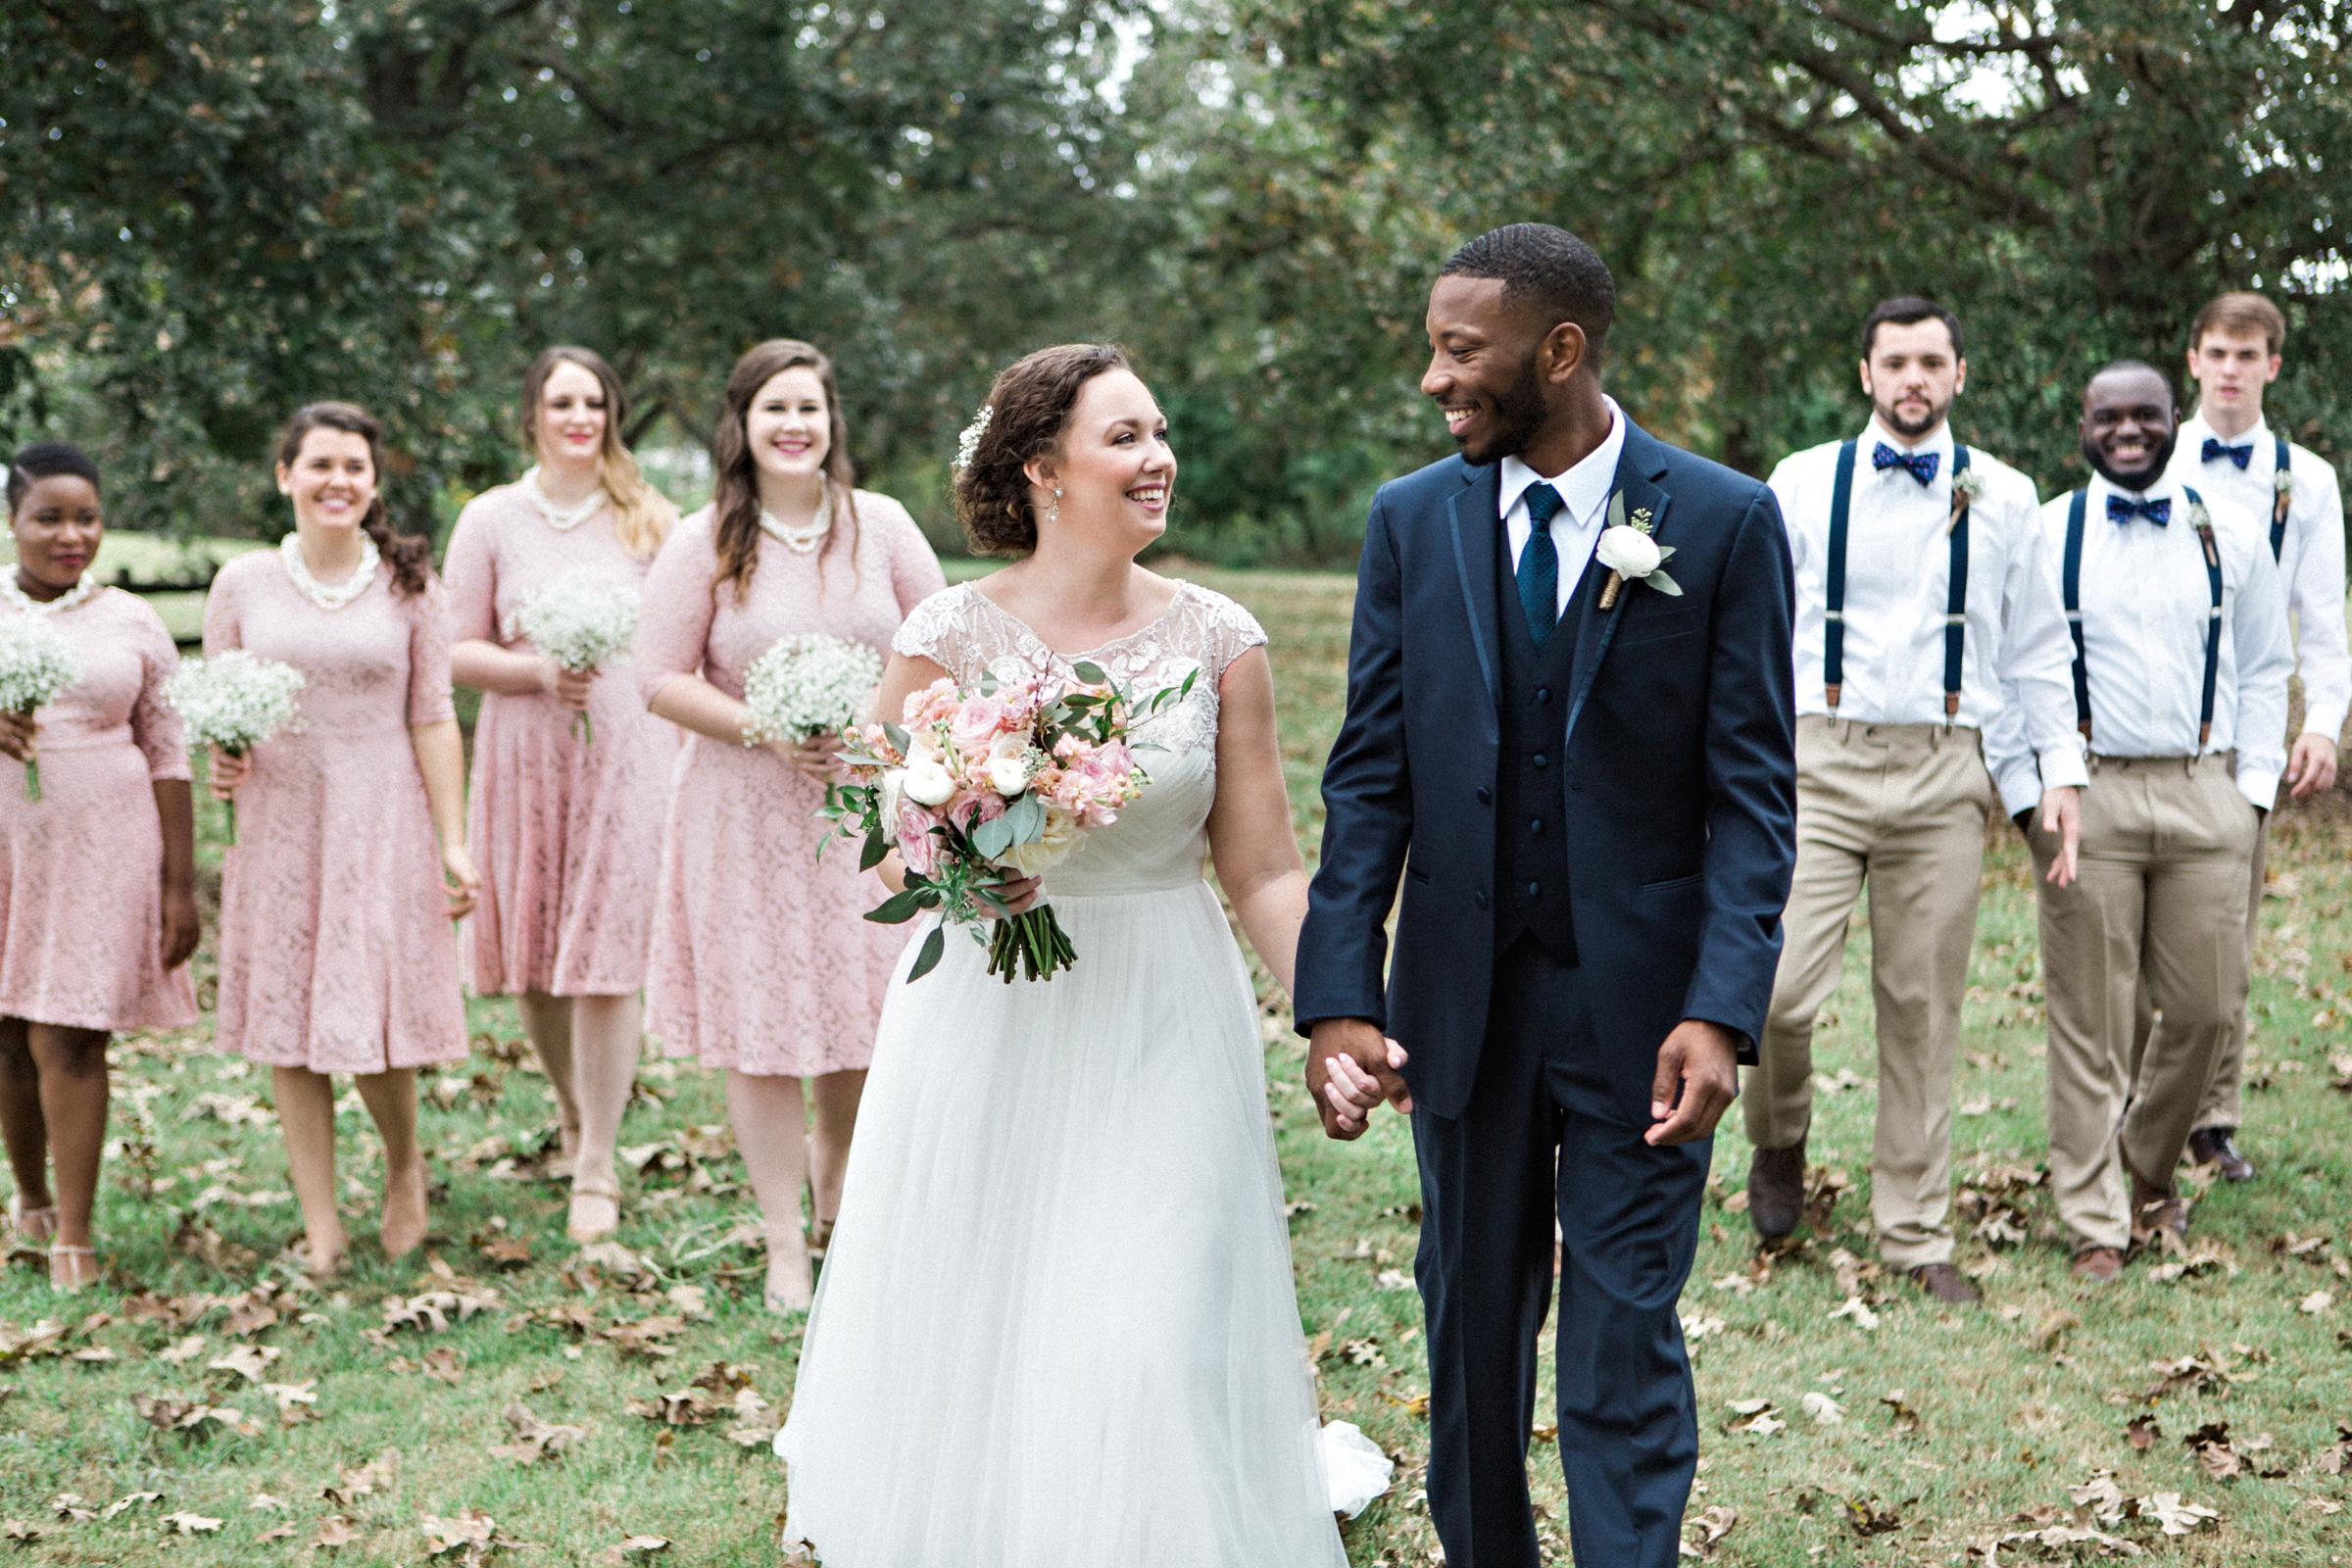 Alabama-Wedding-Photography-Nick-Drollette-Cory-Laura-139.jpg